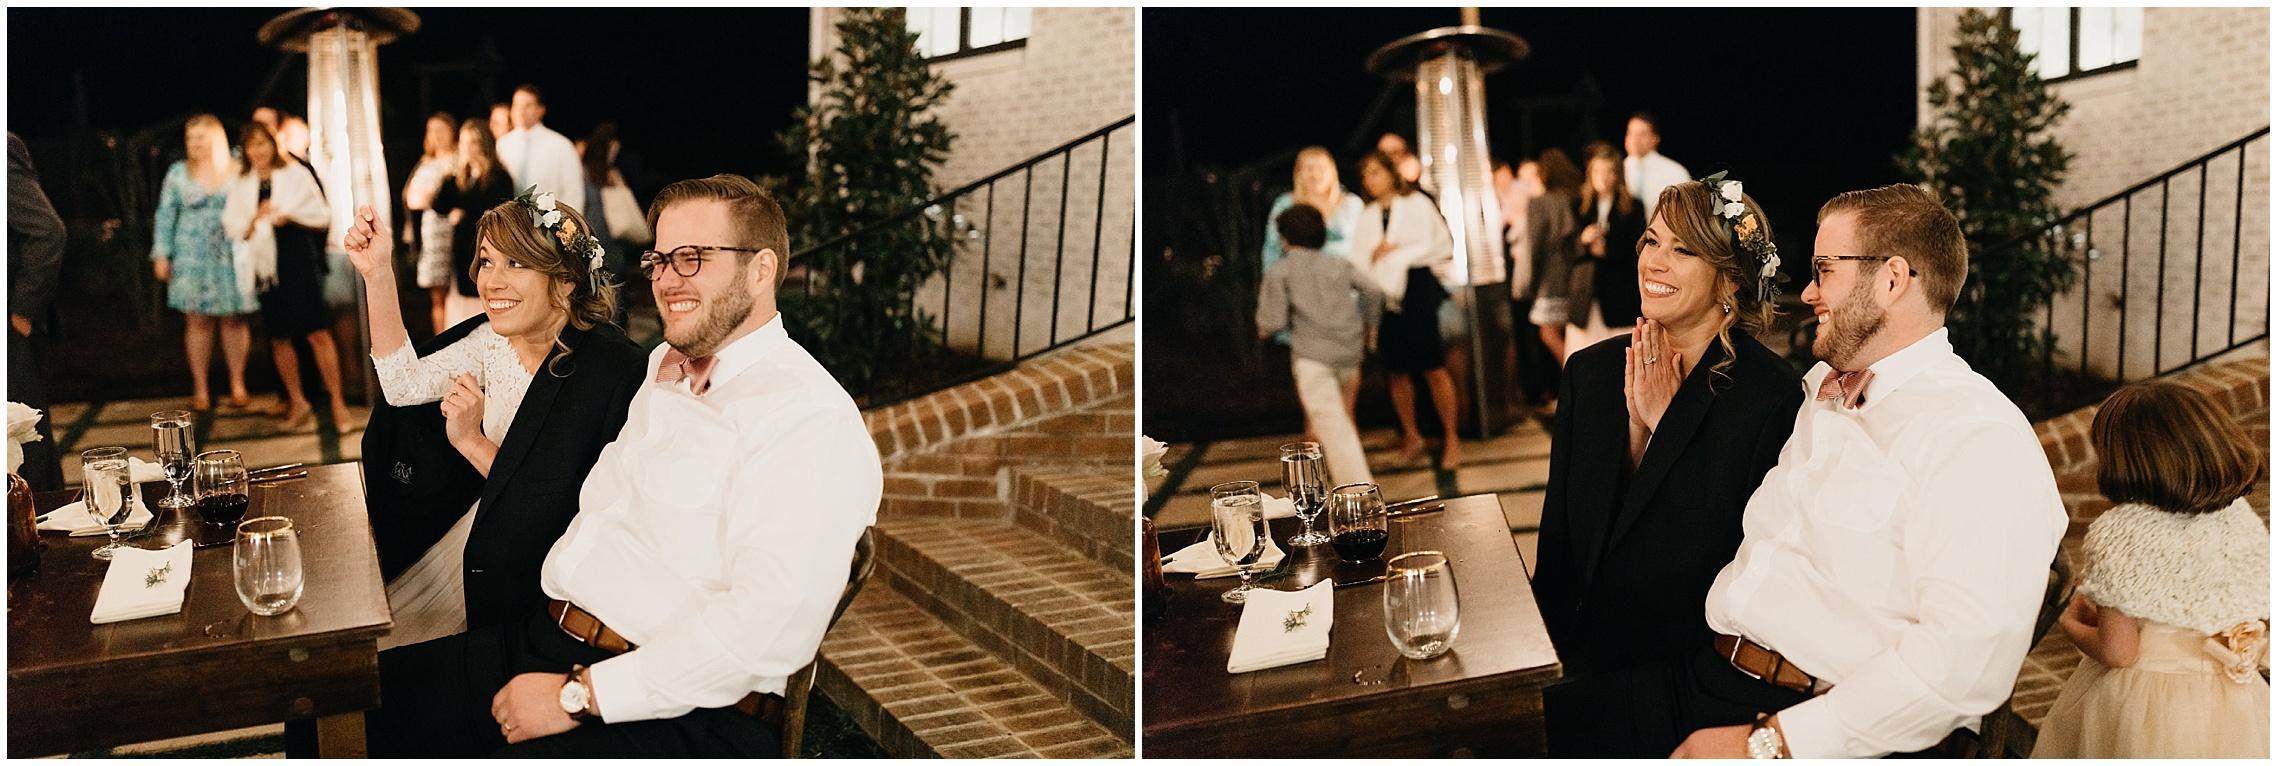 estes_park_wedding_colorado_photographer_0122.jpg